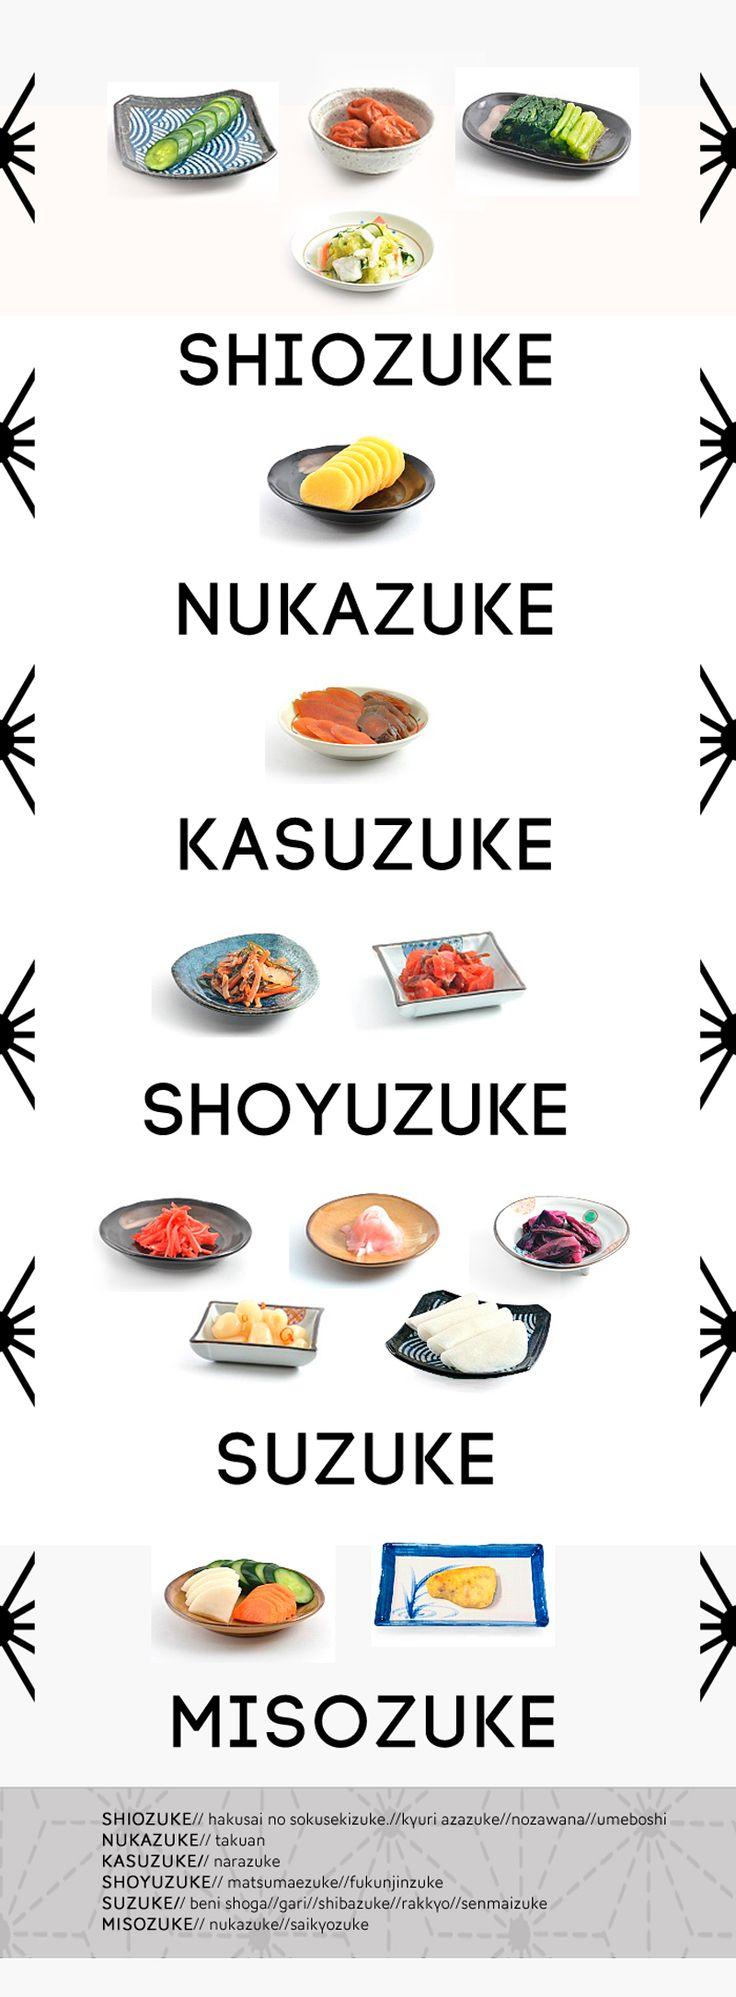 variedades de encurtido japoneses. tsukemono